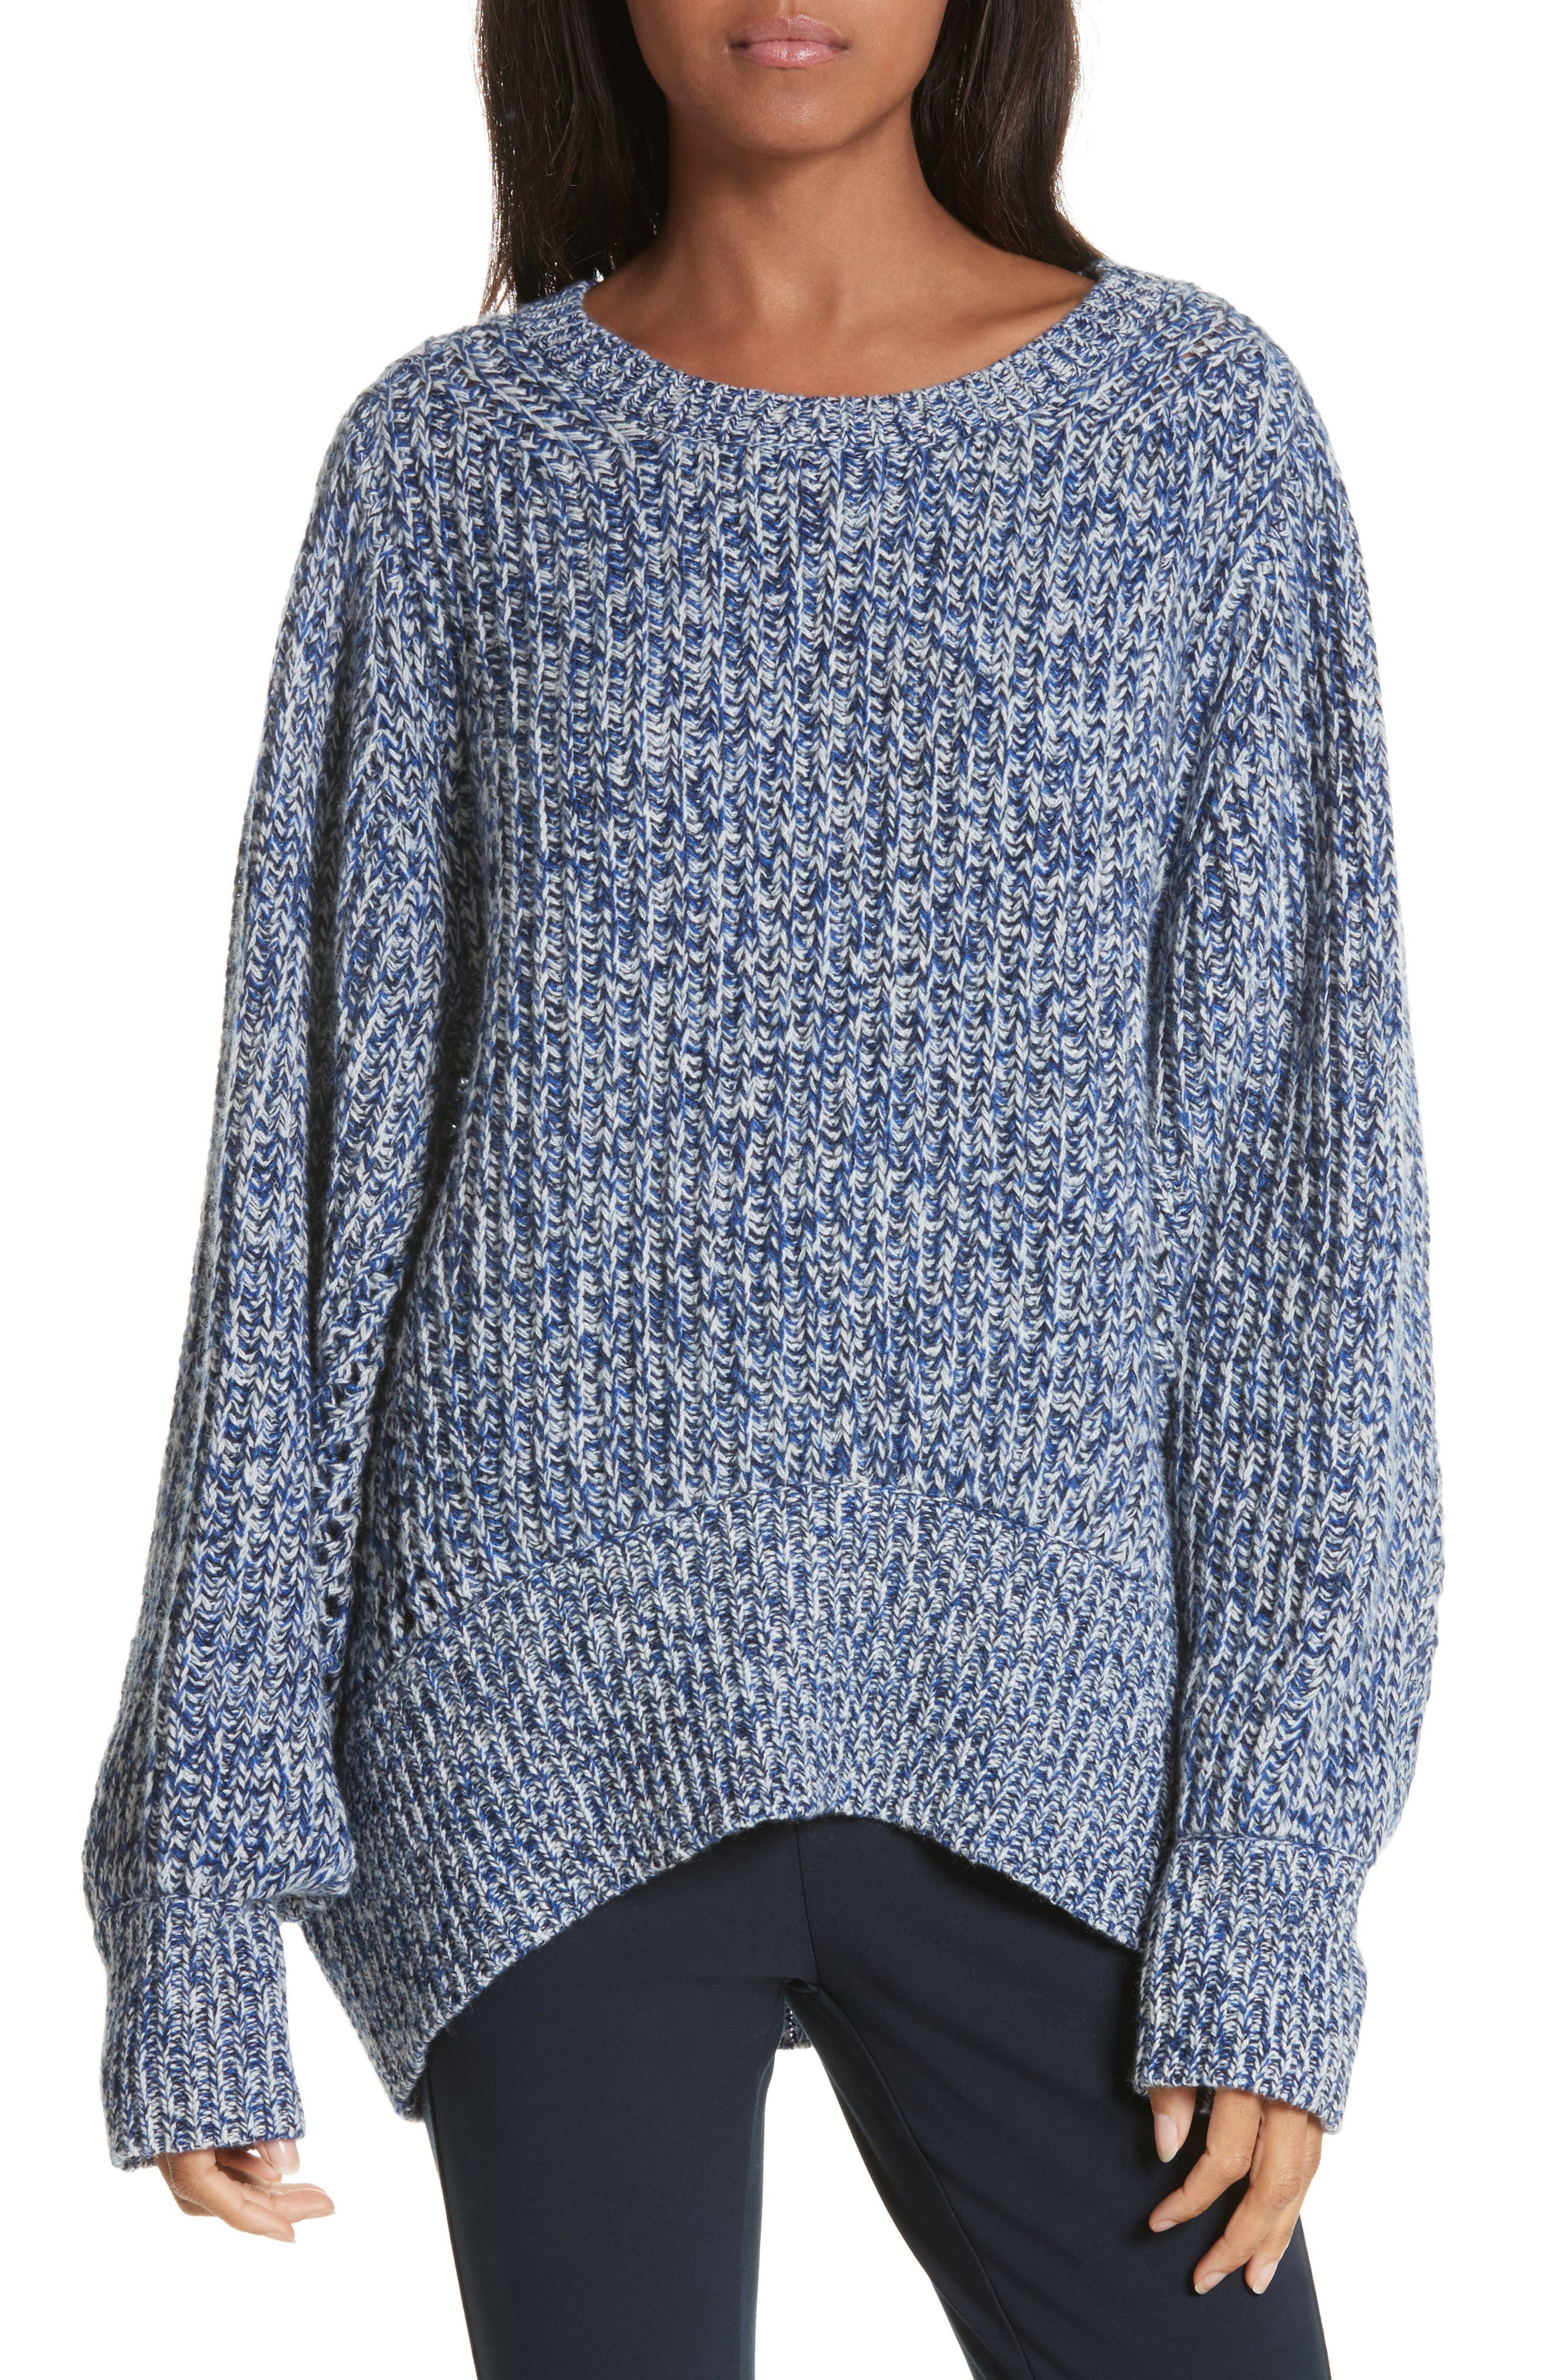 Athena Cashmere Pullover,                         Main,                         color, Bright Blue/ Black/ Ivory